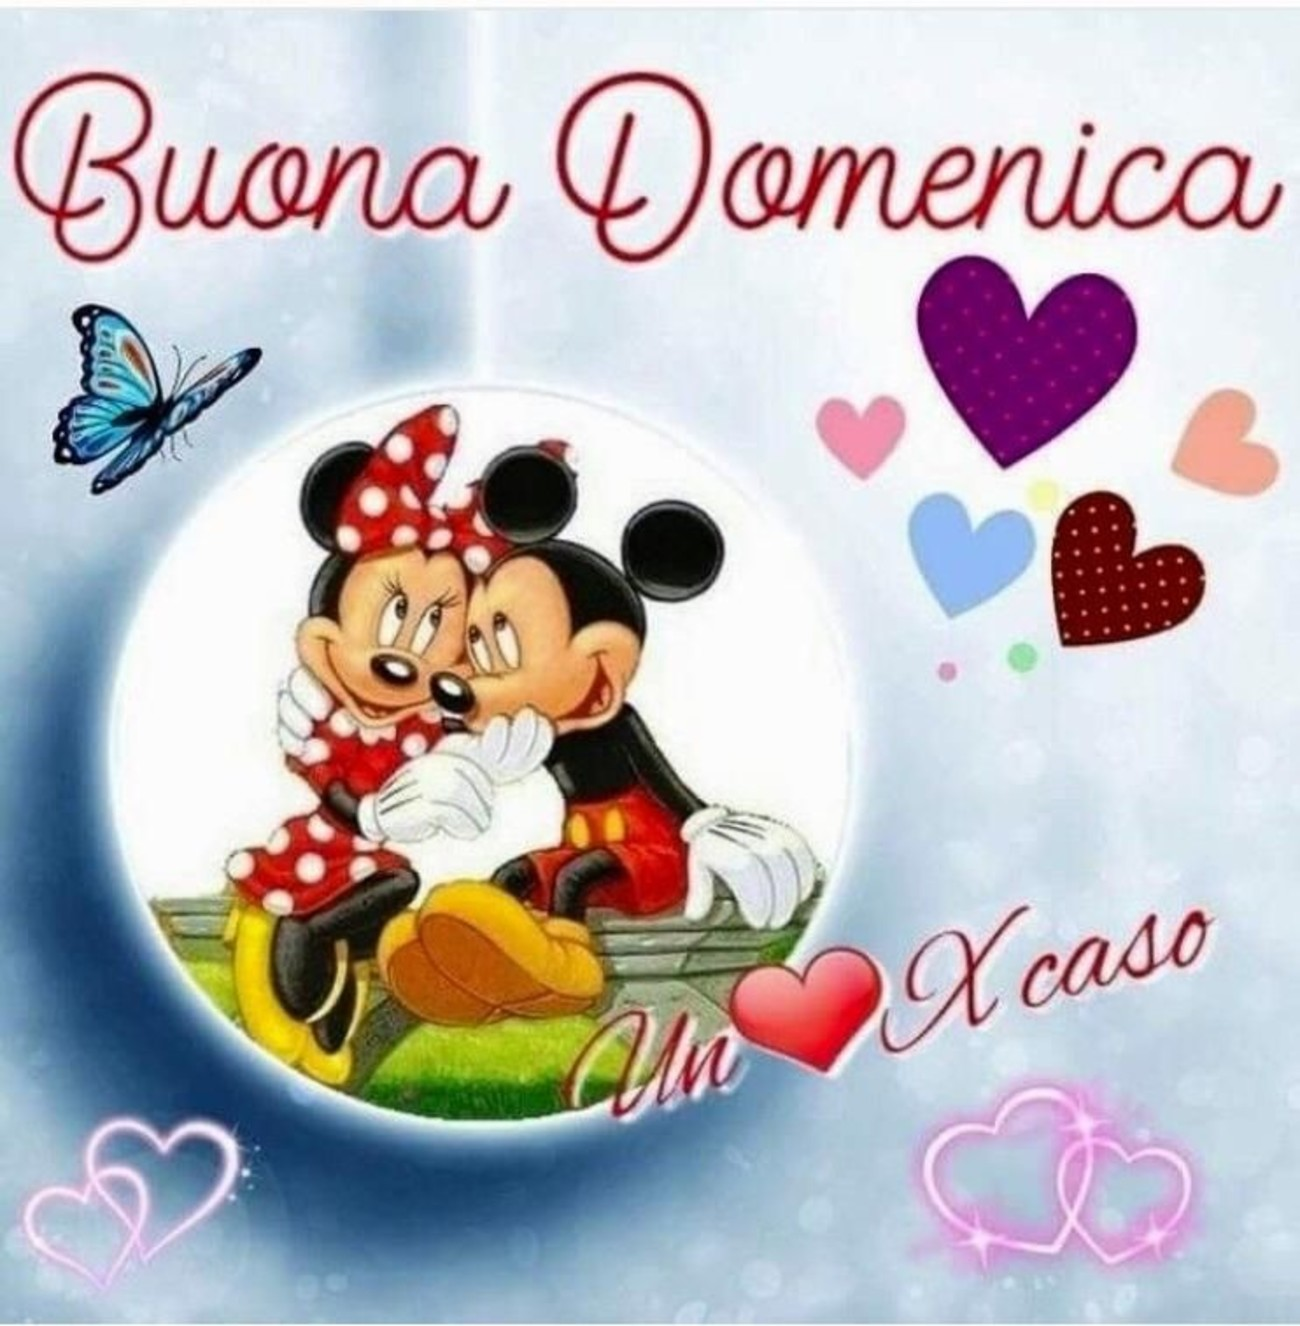 Buona Domenica Disney 7